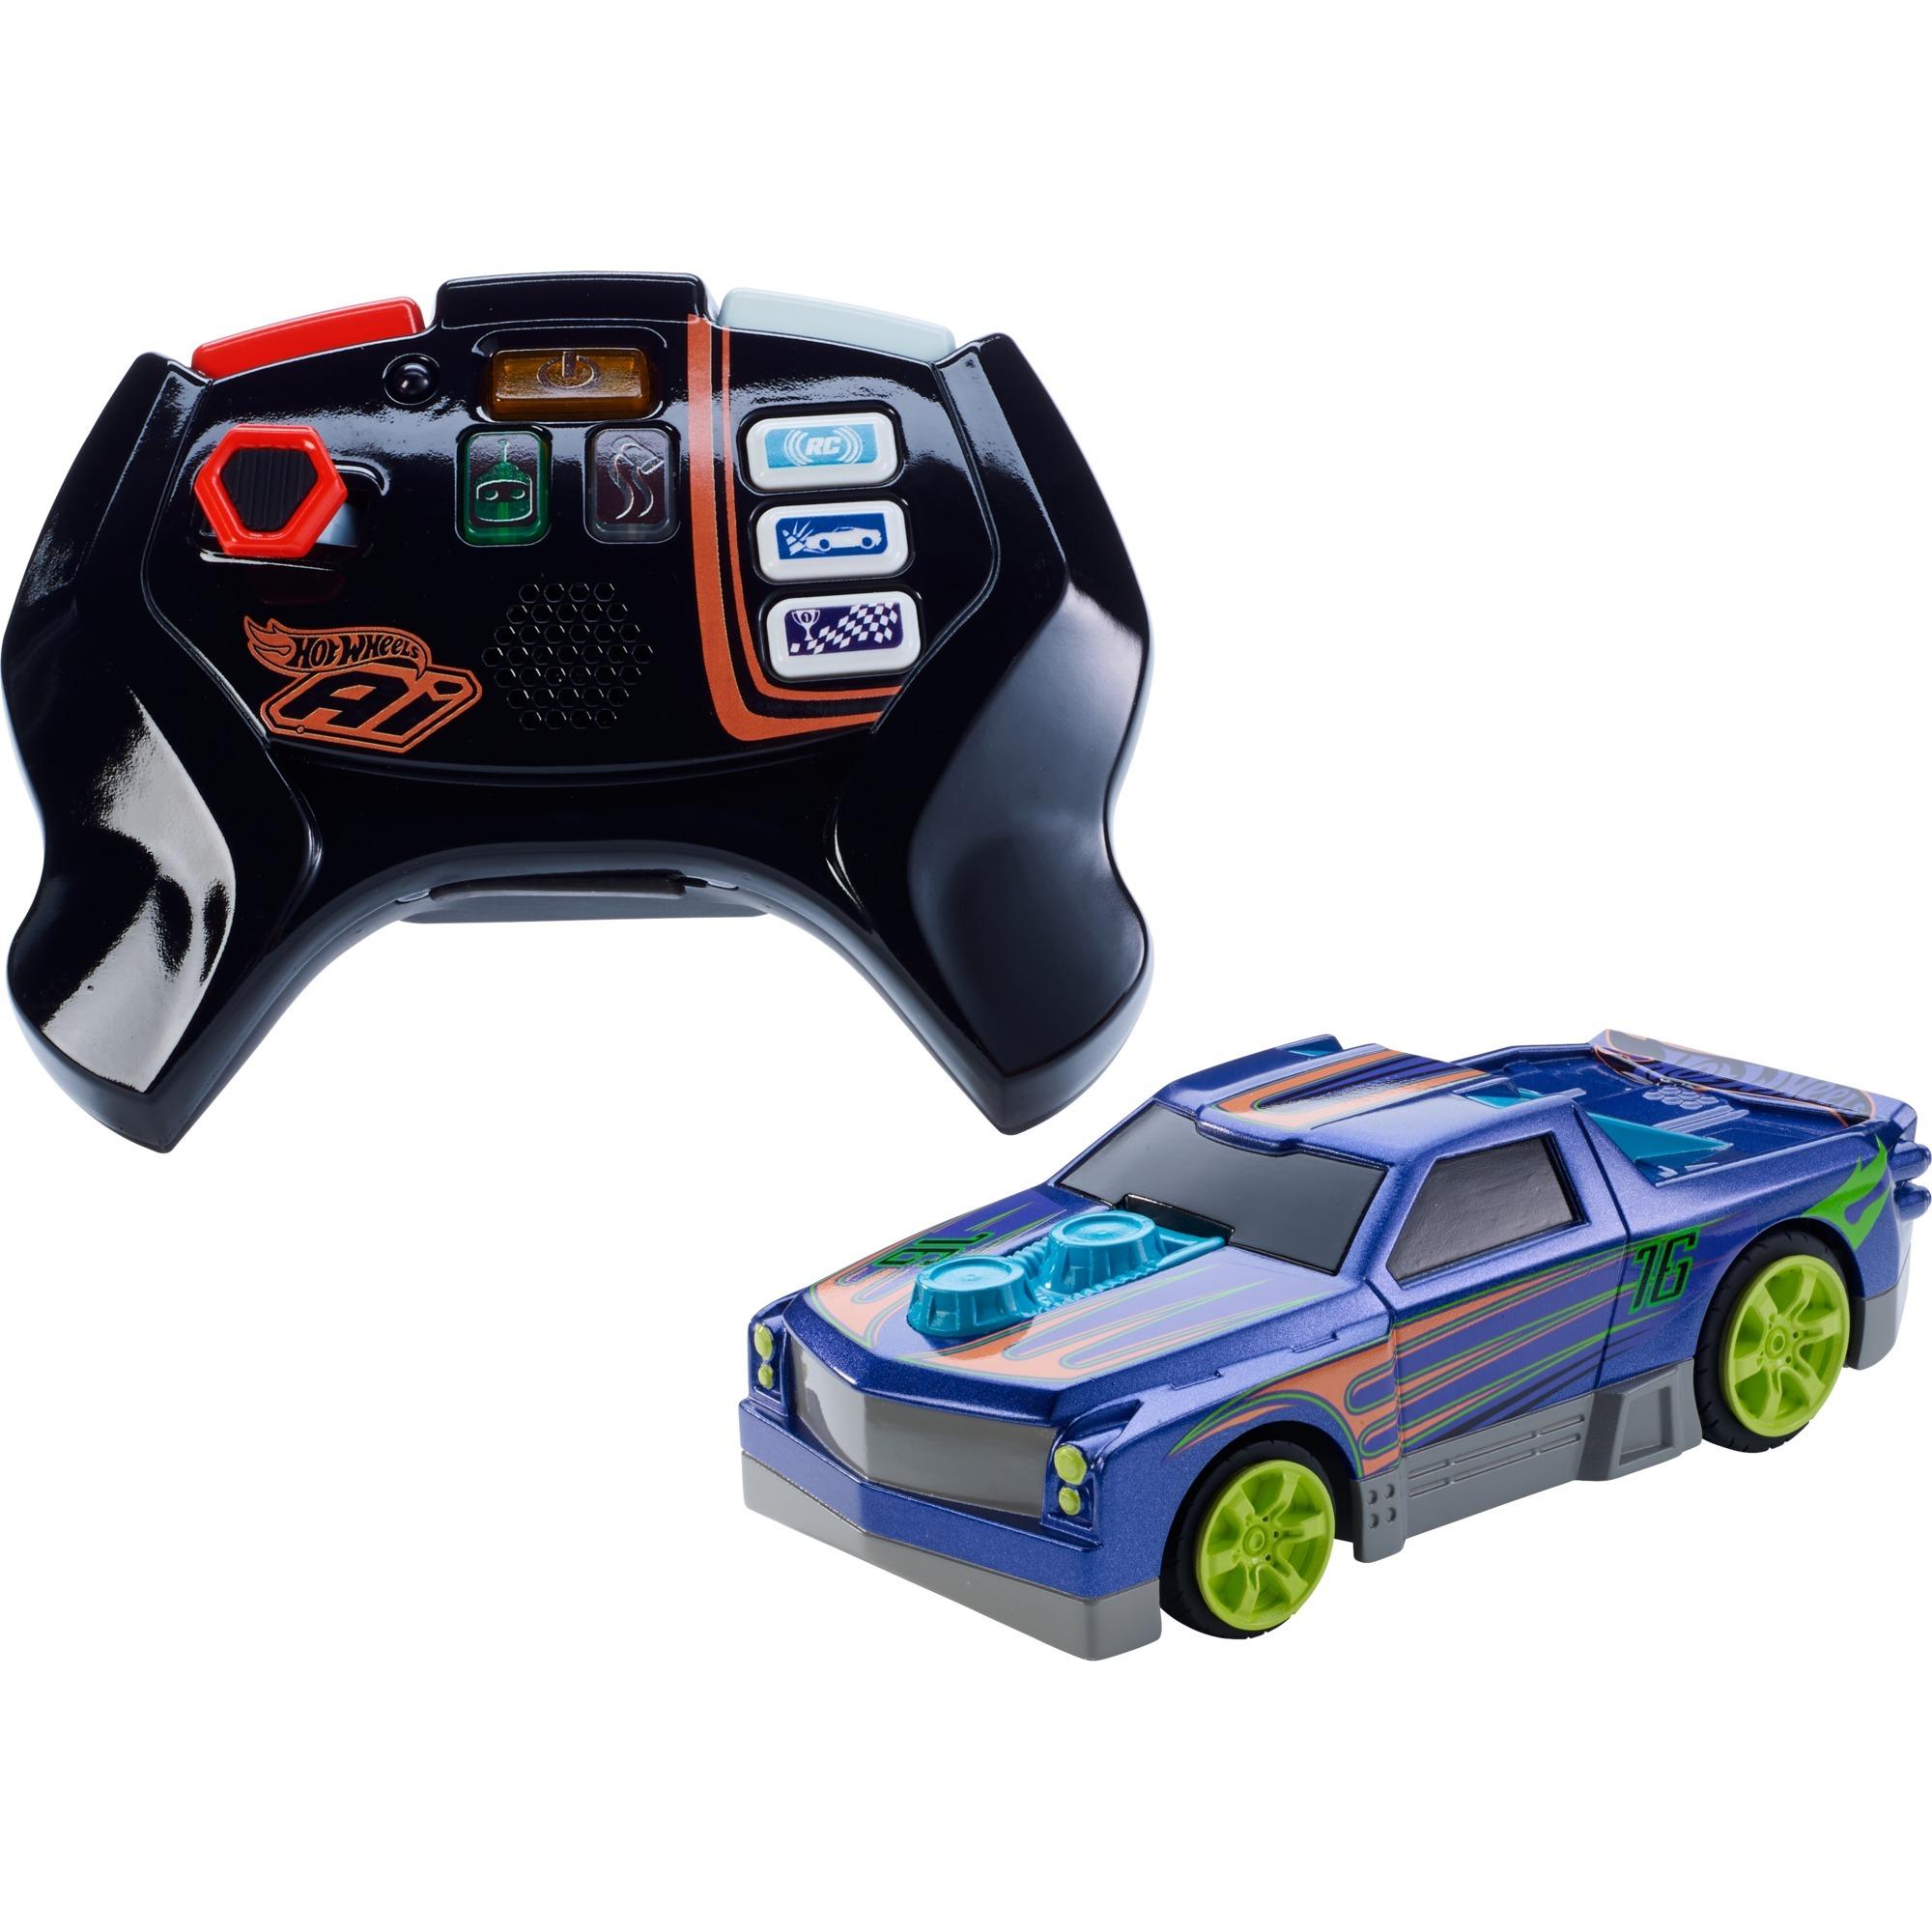 Hot Wheels A.I. Smart Car Turbo Diesel + Controller, Voiture de course